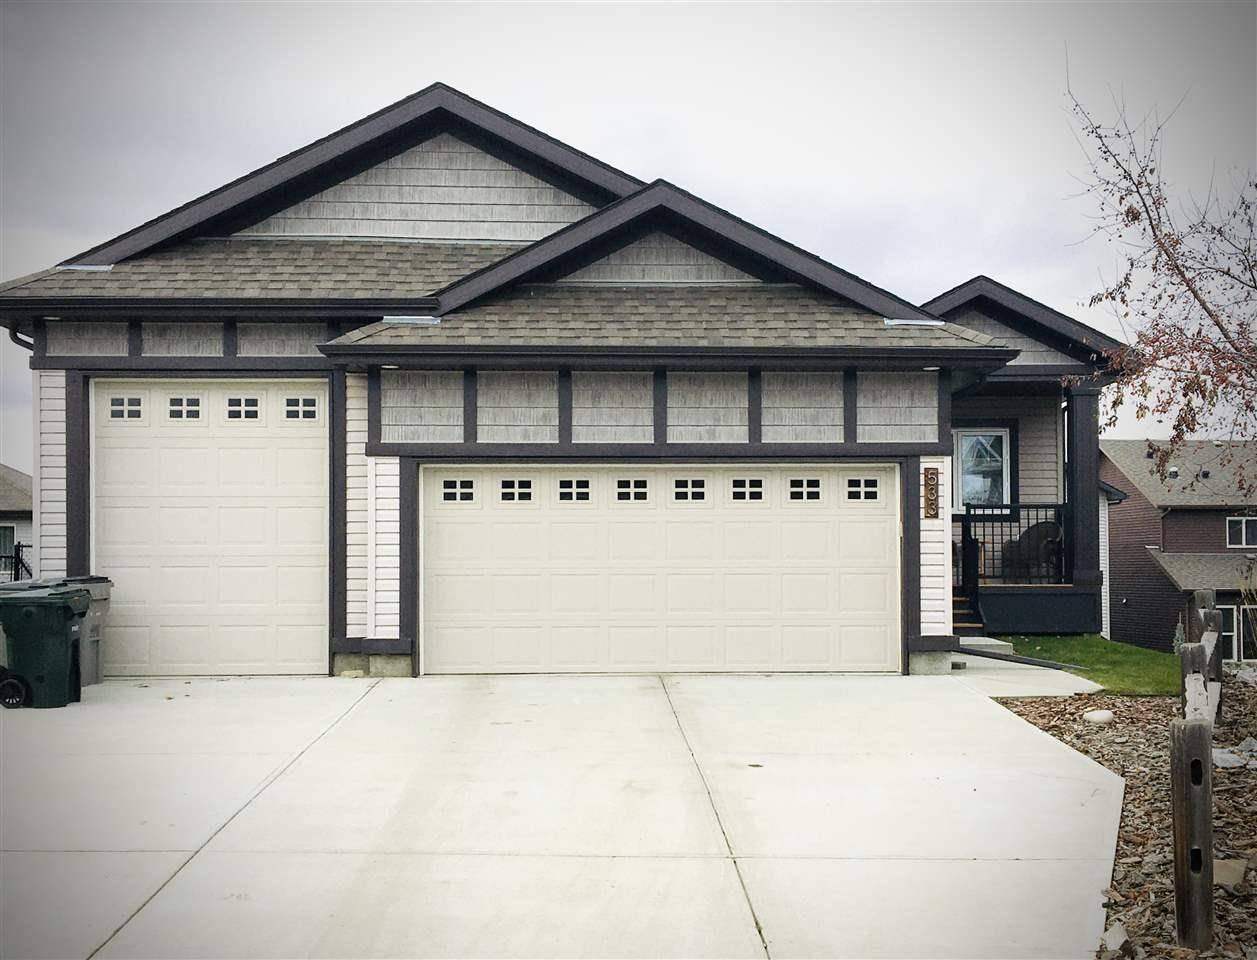 House for sale at 533 Westerra Blvd Stony Plain Alberta - MLS: E4179738